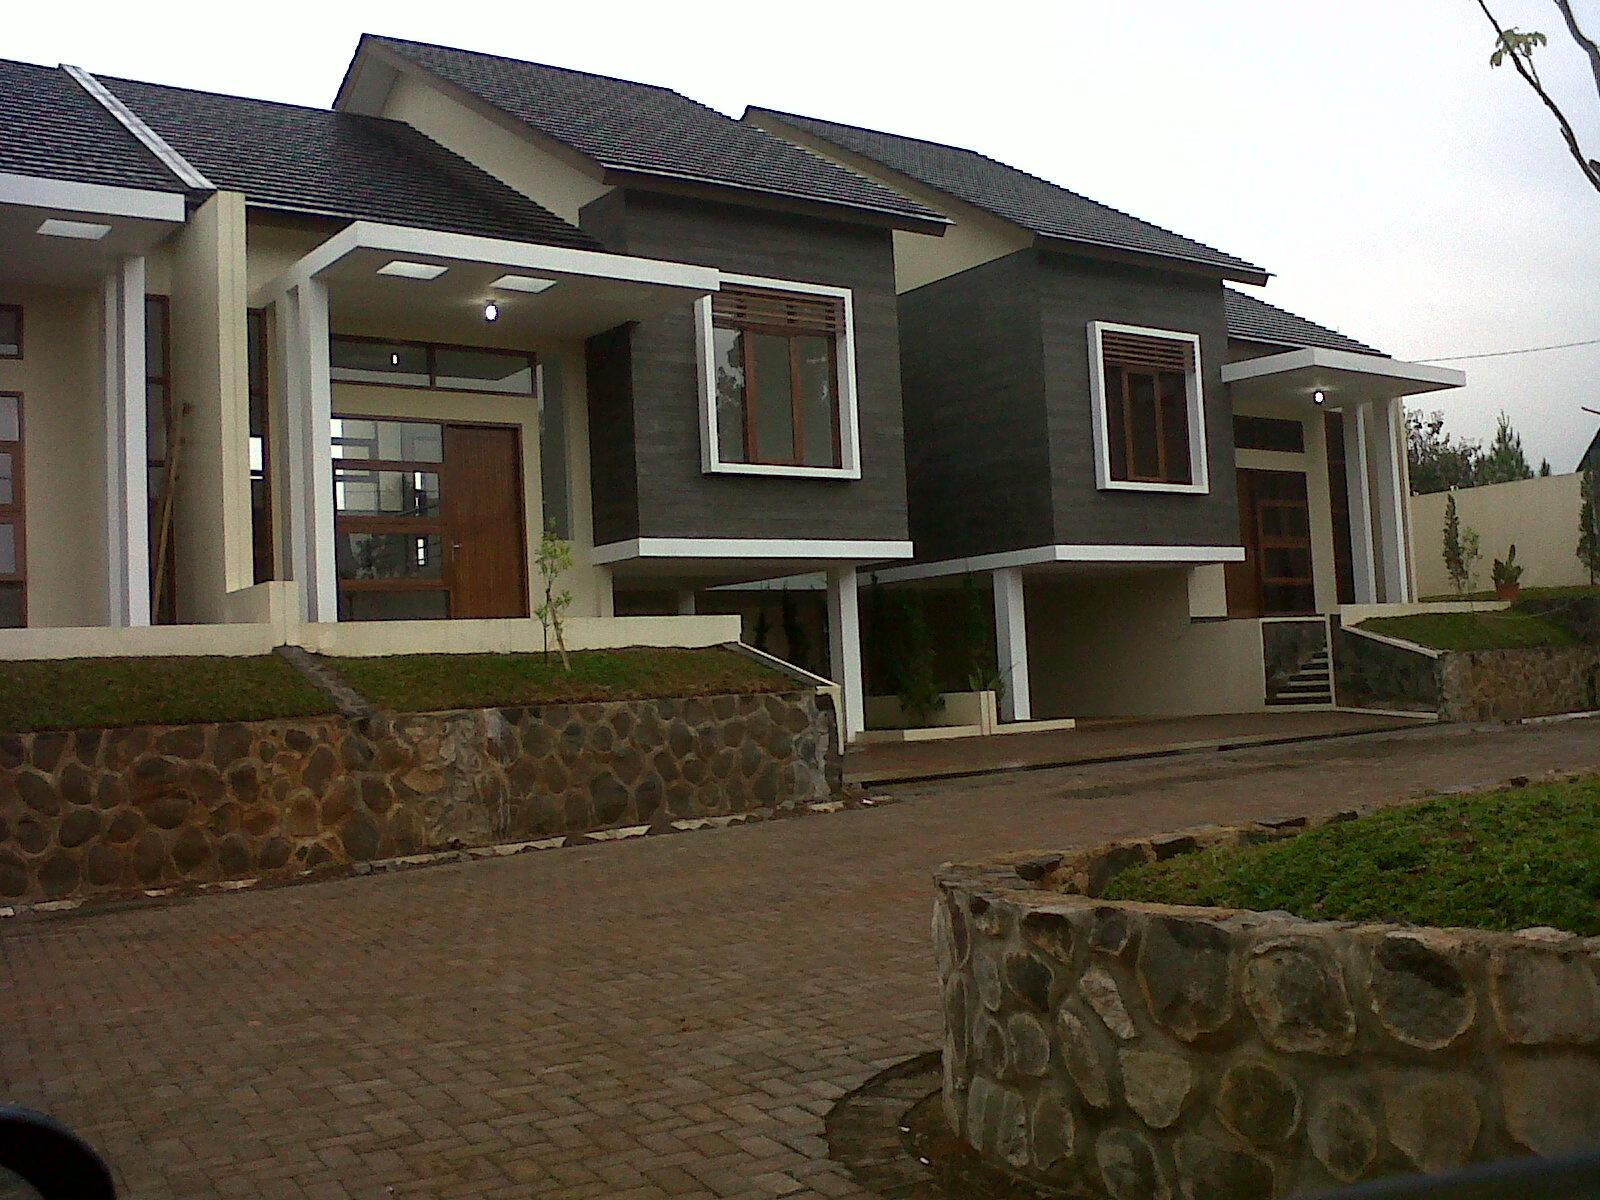 Dijual Rumah Gress Minimalis Harga Rp 775000000 Sekitar Vila